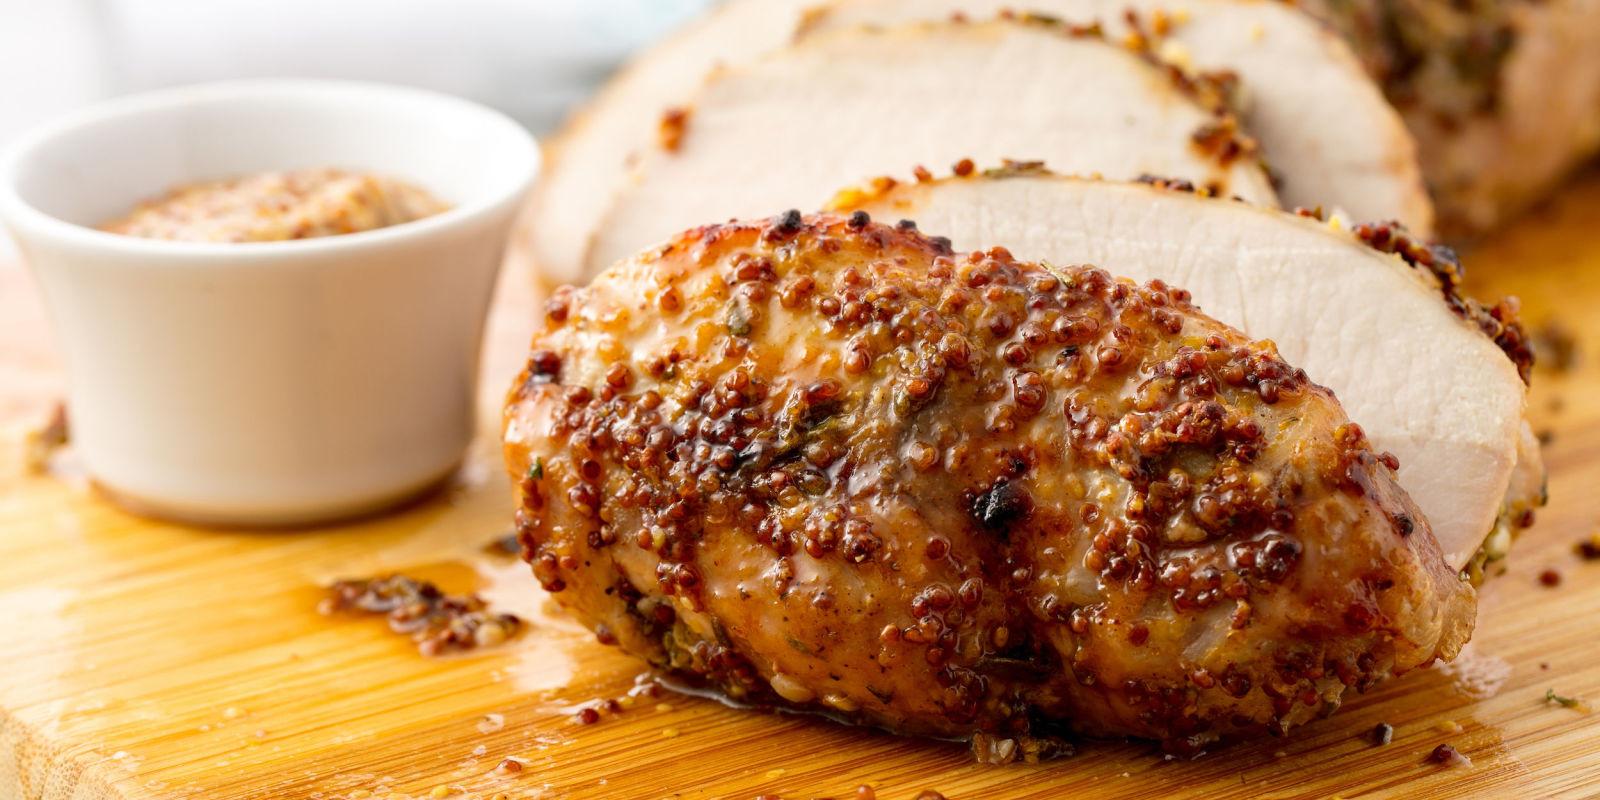 Recipe For Pork Loin Roast  Best Boneless Pork Loin Roast Recipe How to Cook an Oven